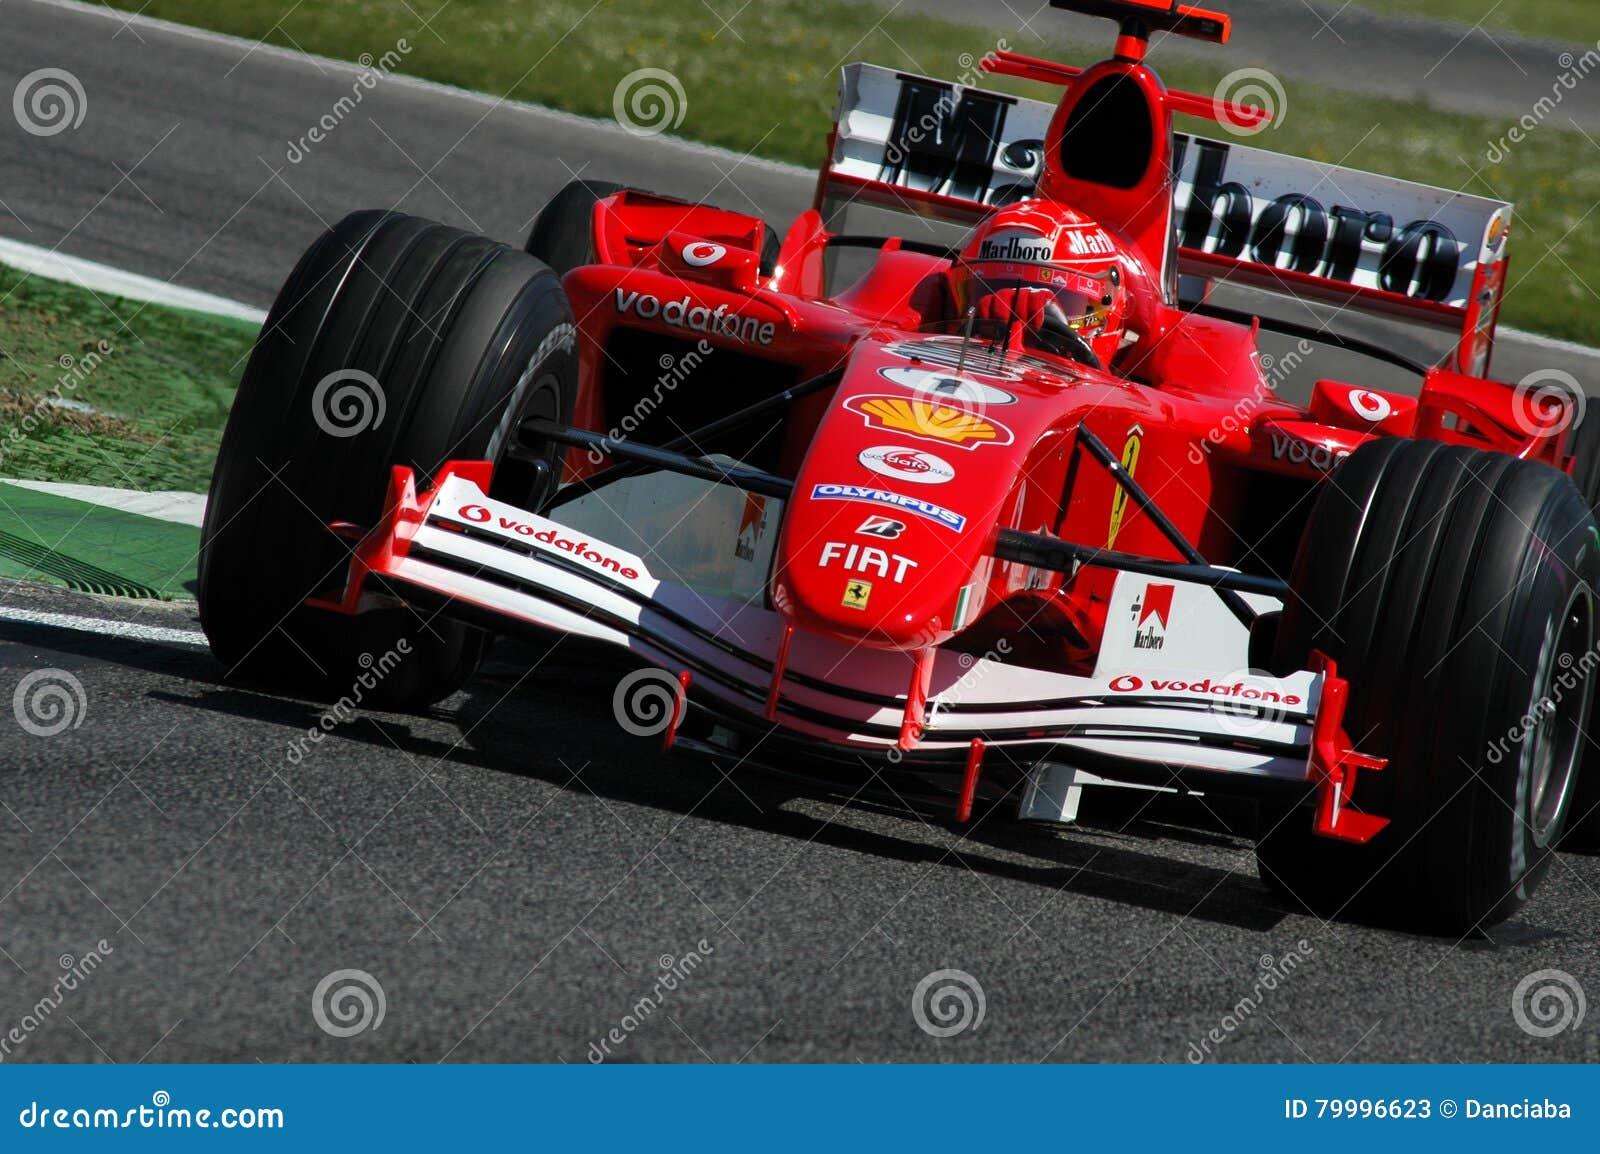 F1 2005 Michael Schumacher Ferrari Redaktionelles Stockfoto Bild Von Gran Marlboro 79996623